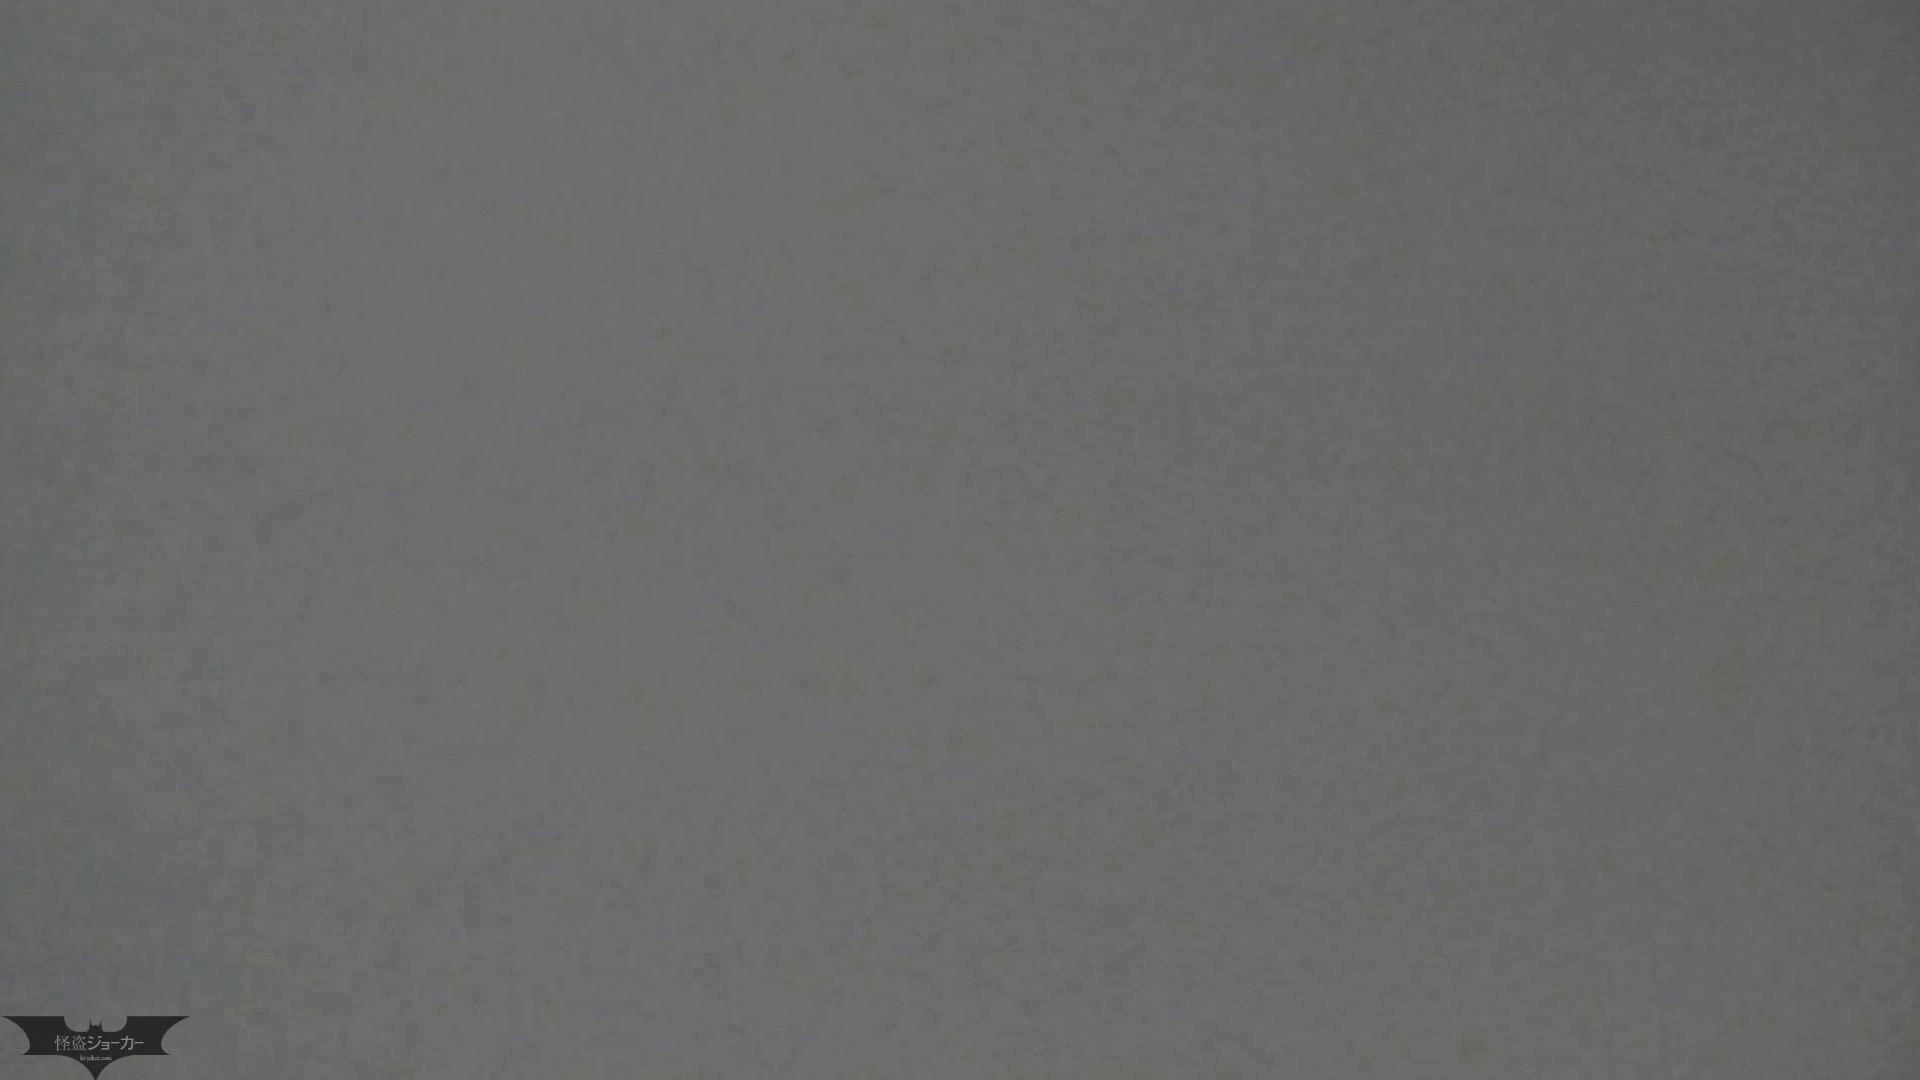 vol.62 来ました。最高作の予感!美しいすぎるハーフ 美人 アダルト動画キャプチャ 97pic 39